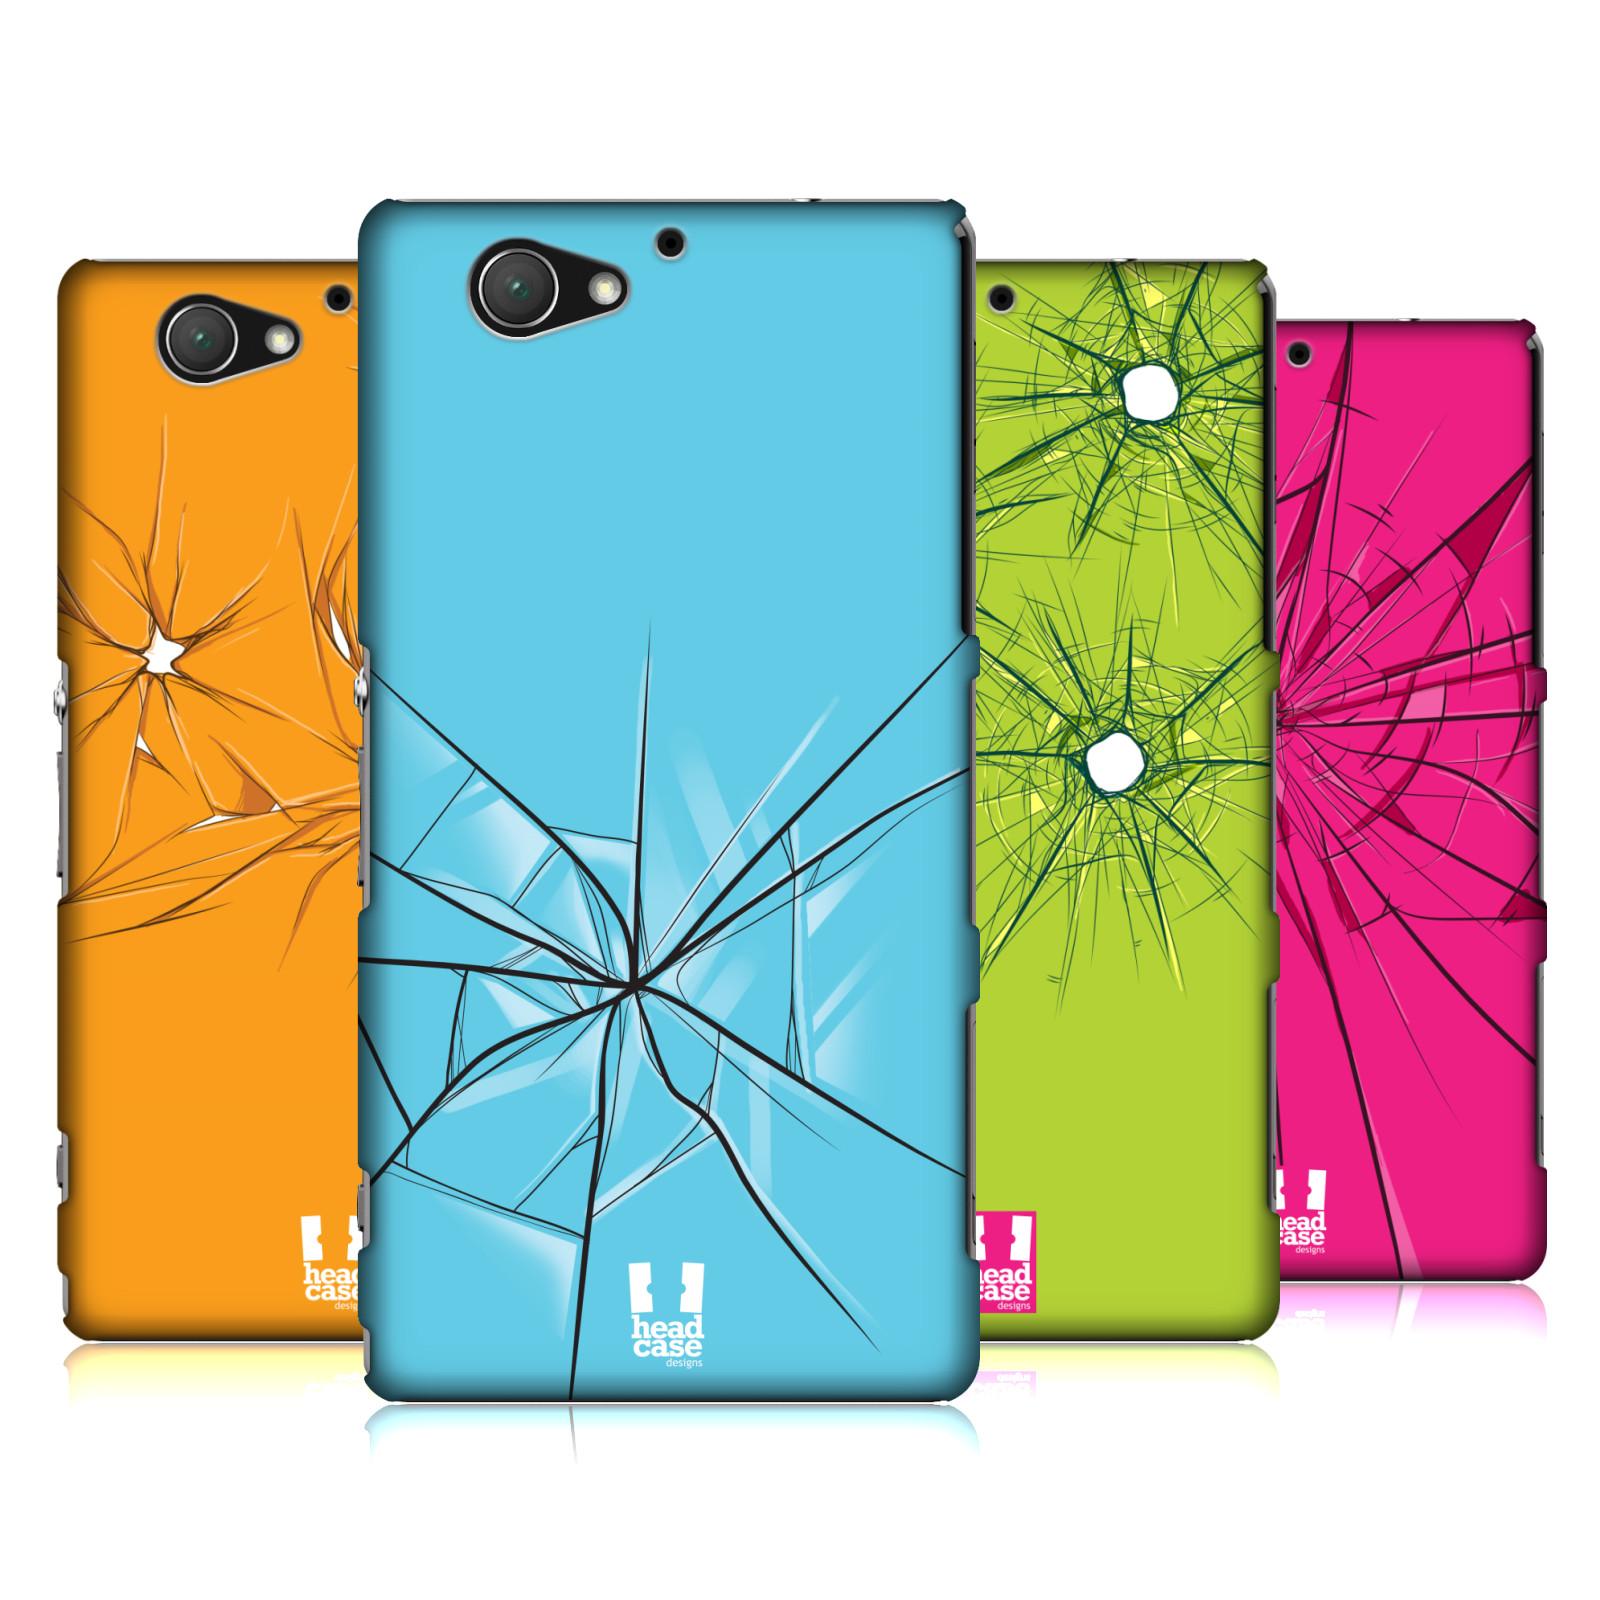 HEAD-CASE-DESIGNS-SHATTERED-HARD-BACK-CASE-FOR-SONY-PHONES-4